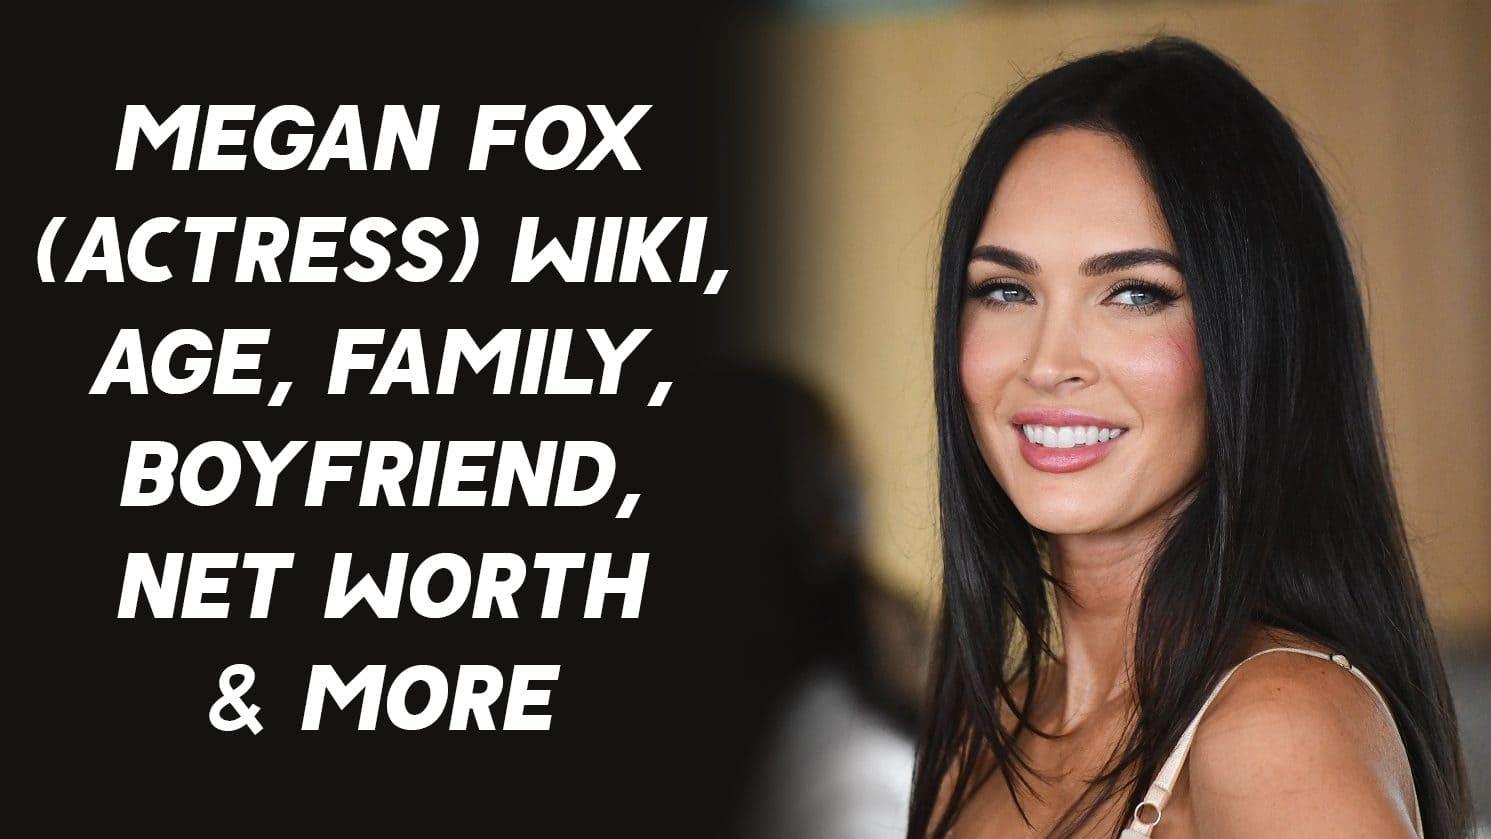 Megan Fox (Actress) Wiki, Age, Family, Boyfriend, Net Worth & More 1